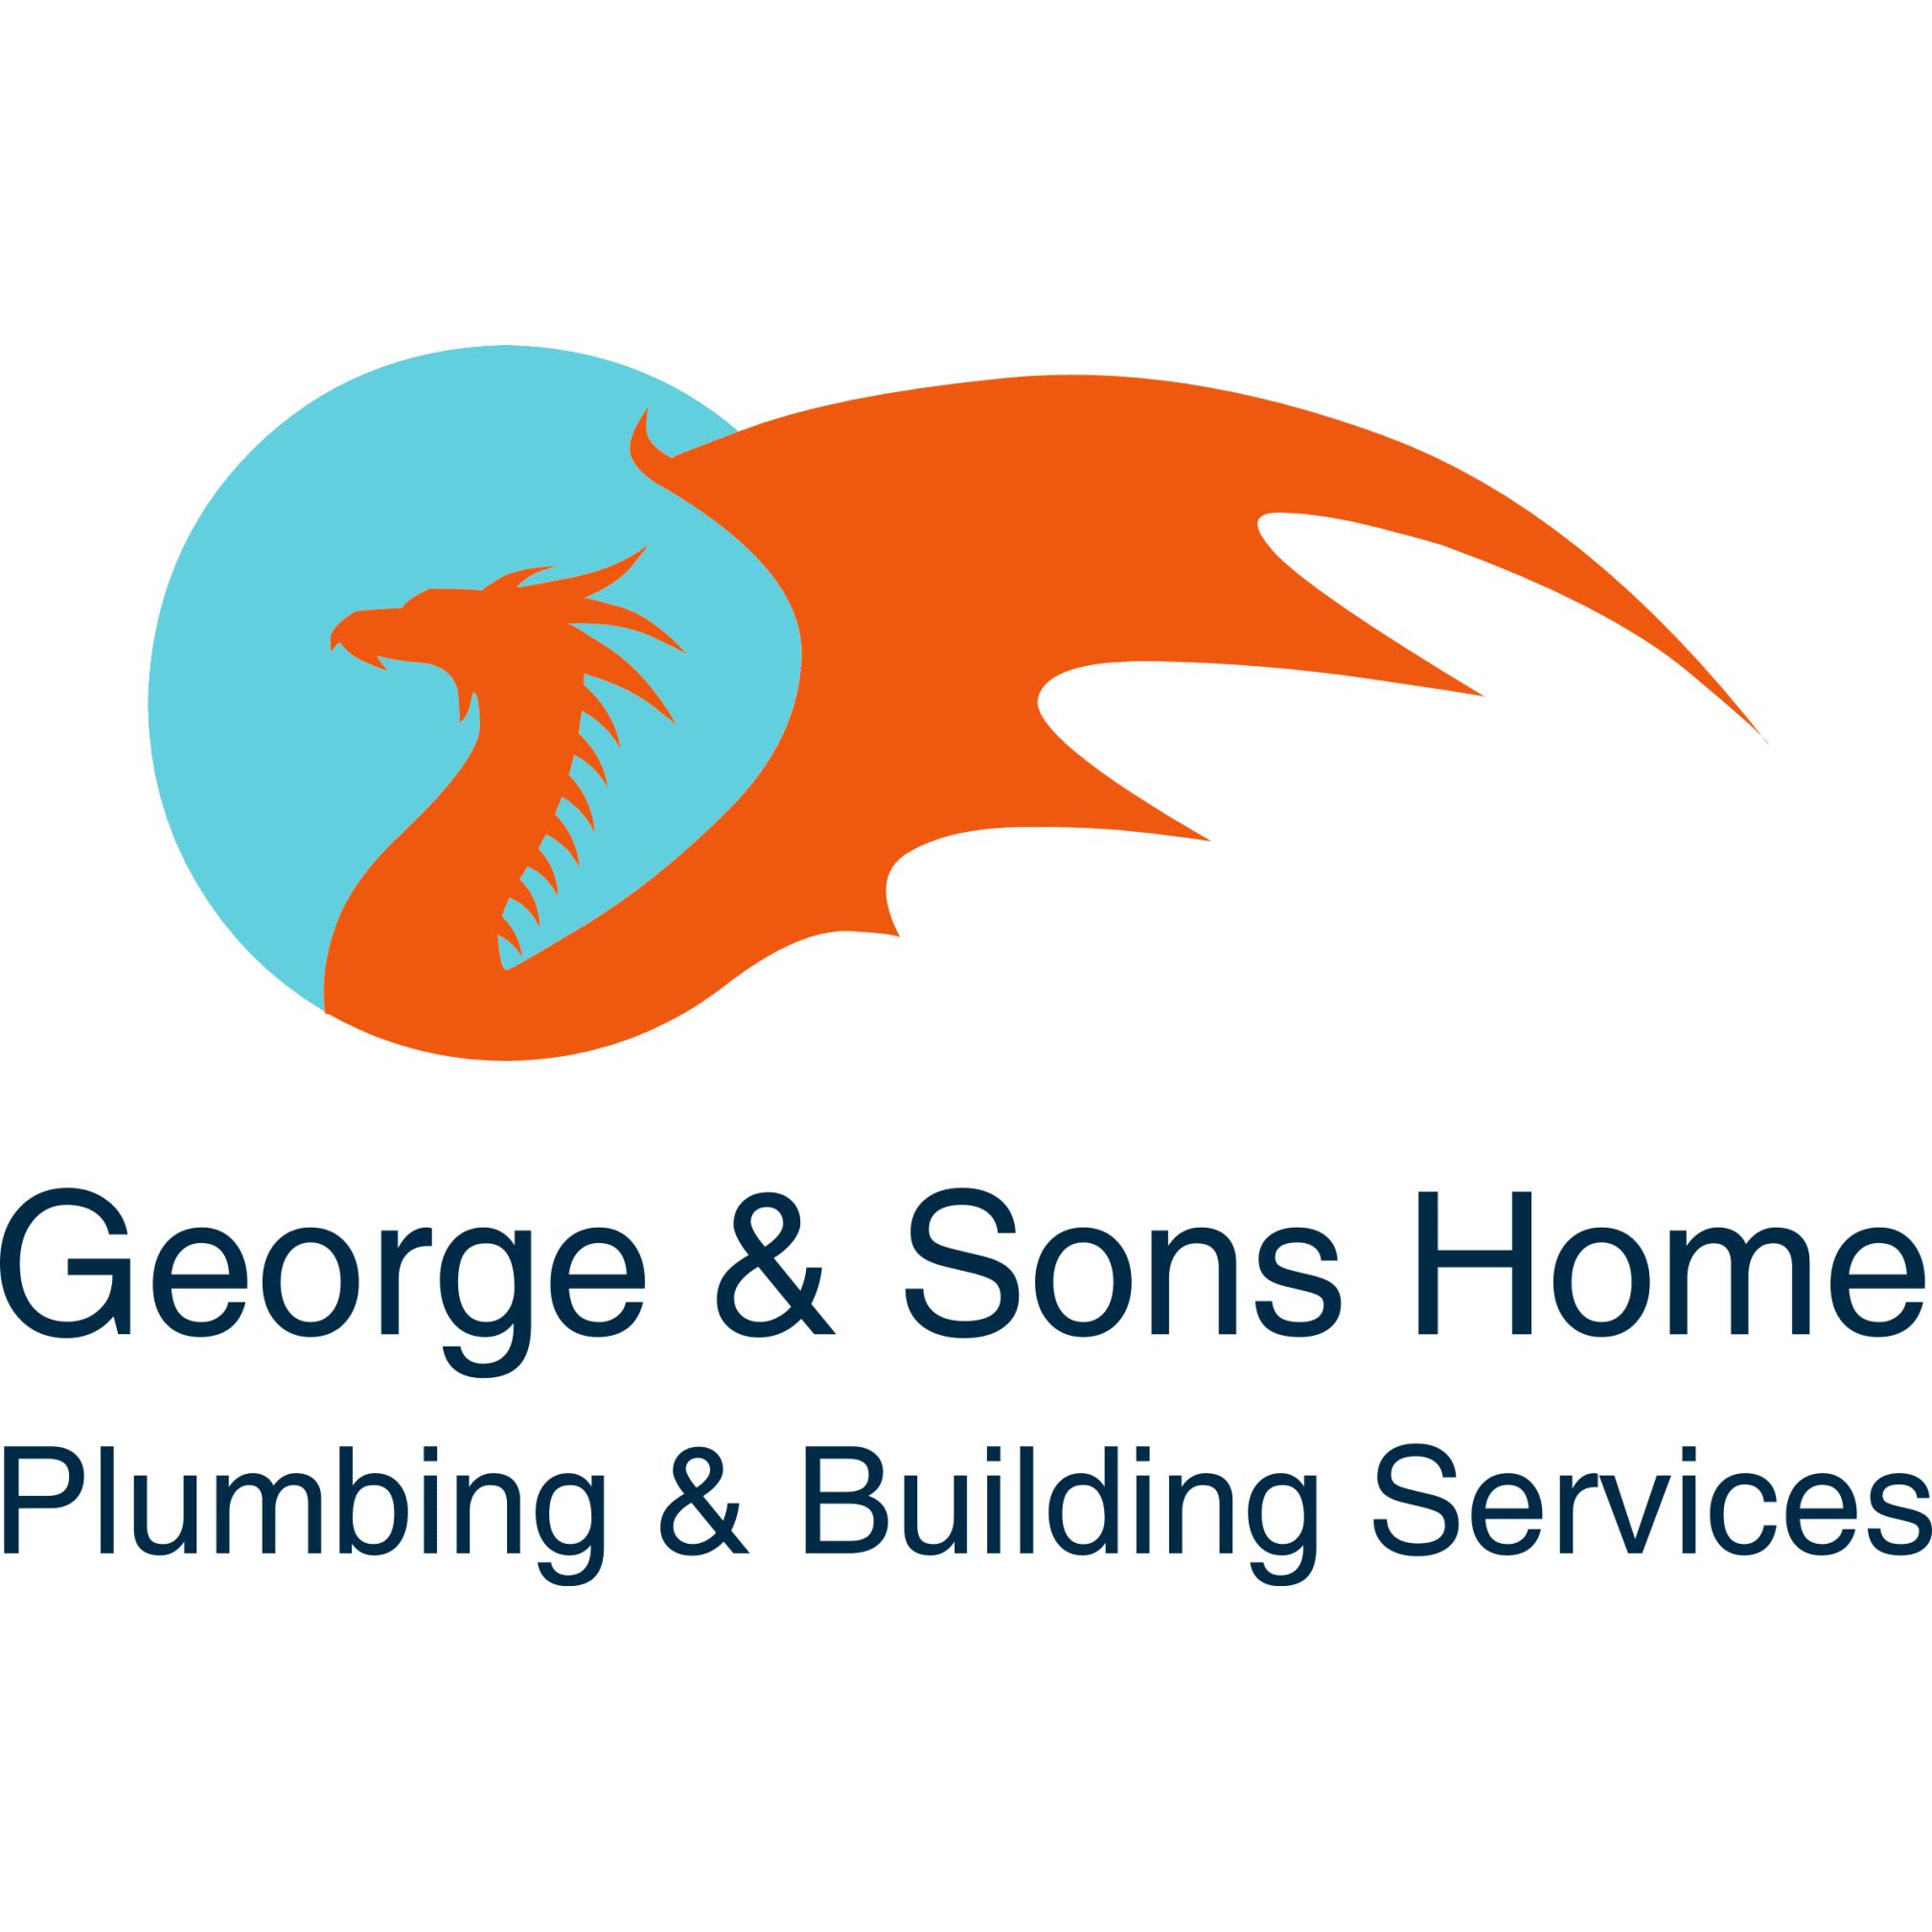 George & Sons Home - Wigan, Lancashire WN5 9QH - 08000 025857 | ShowMeLocal.com